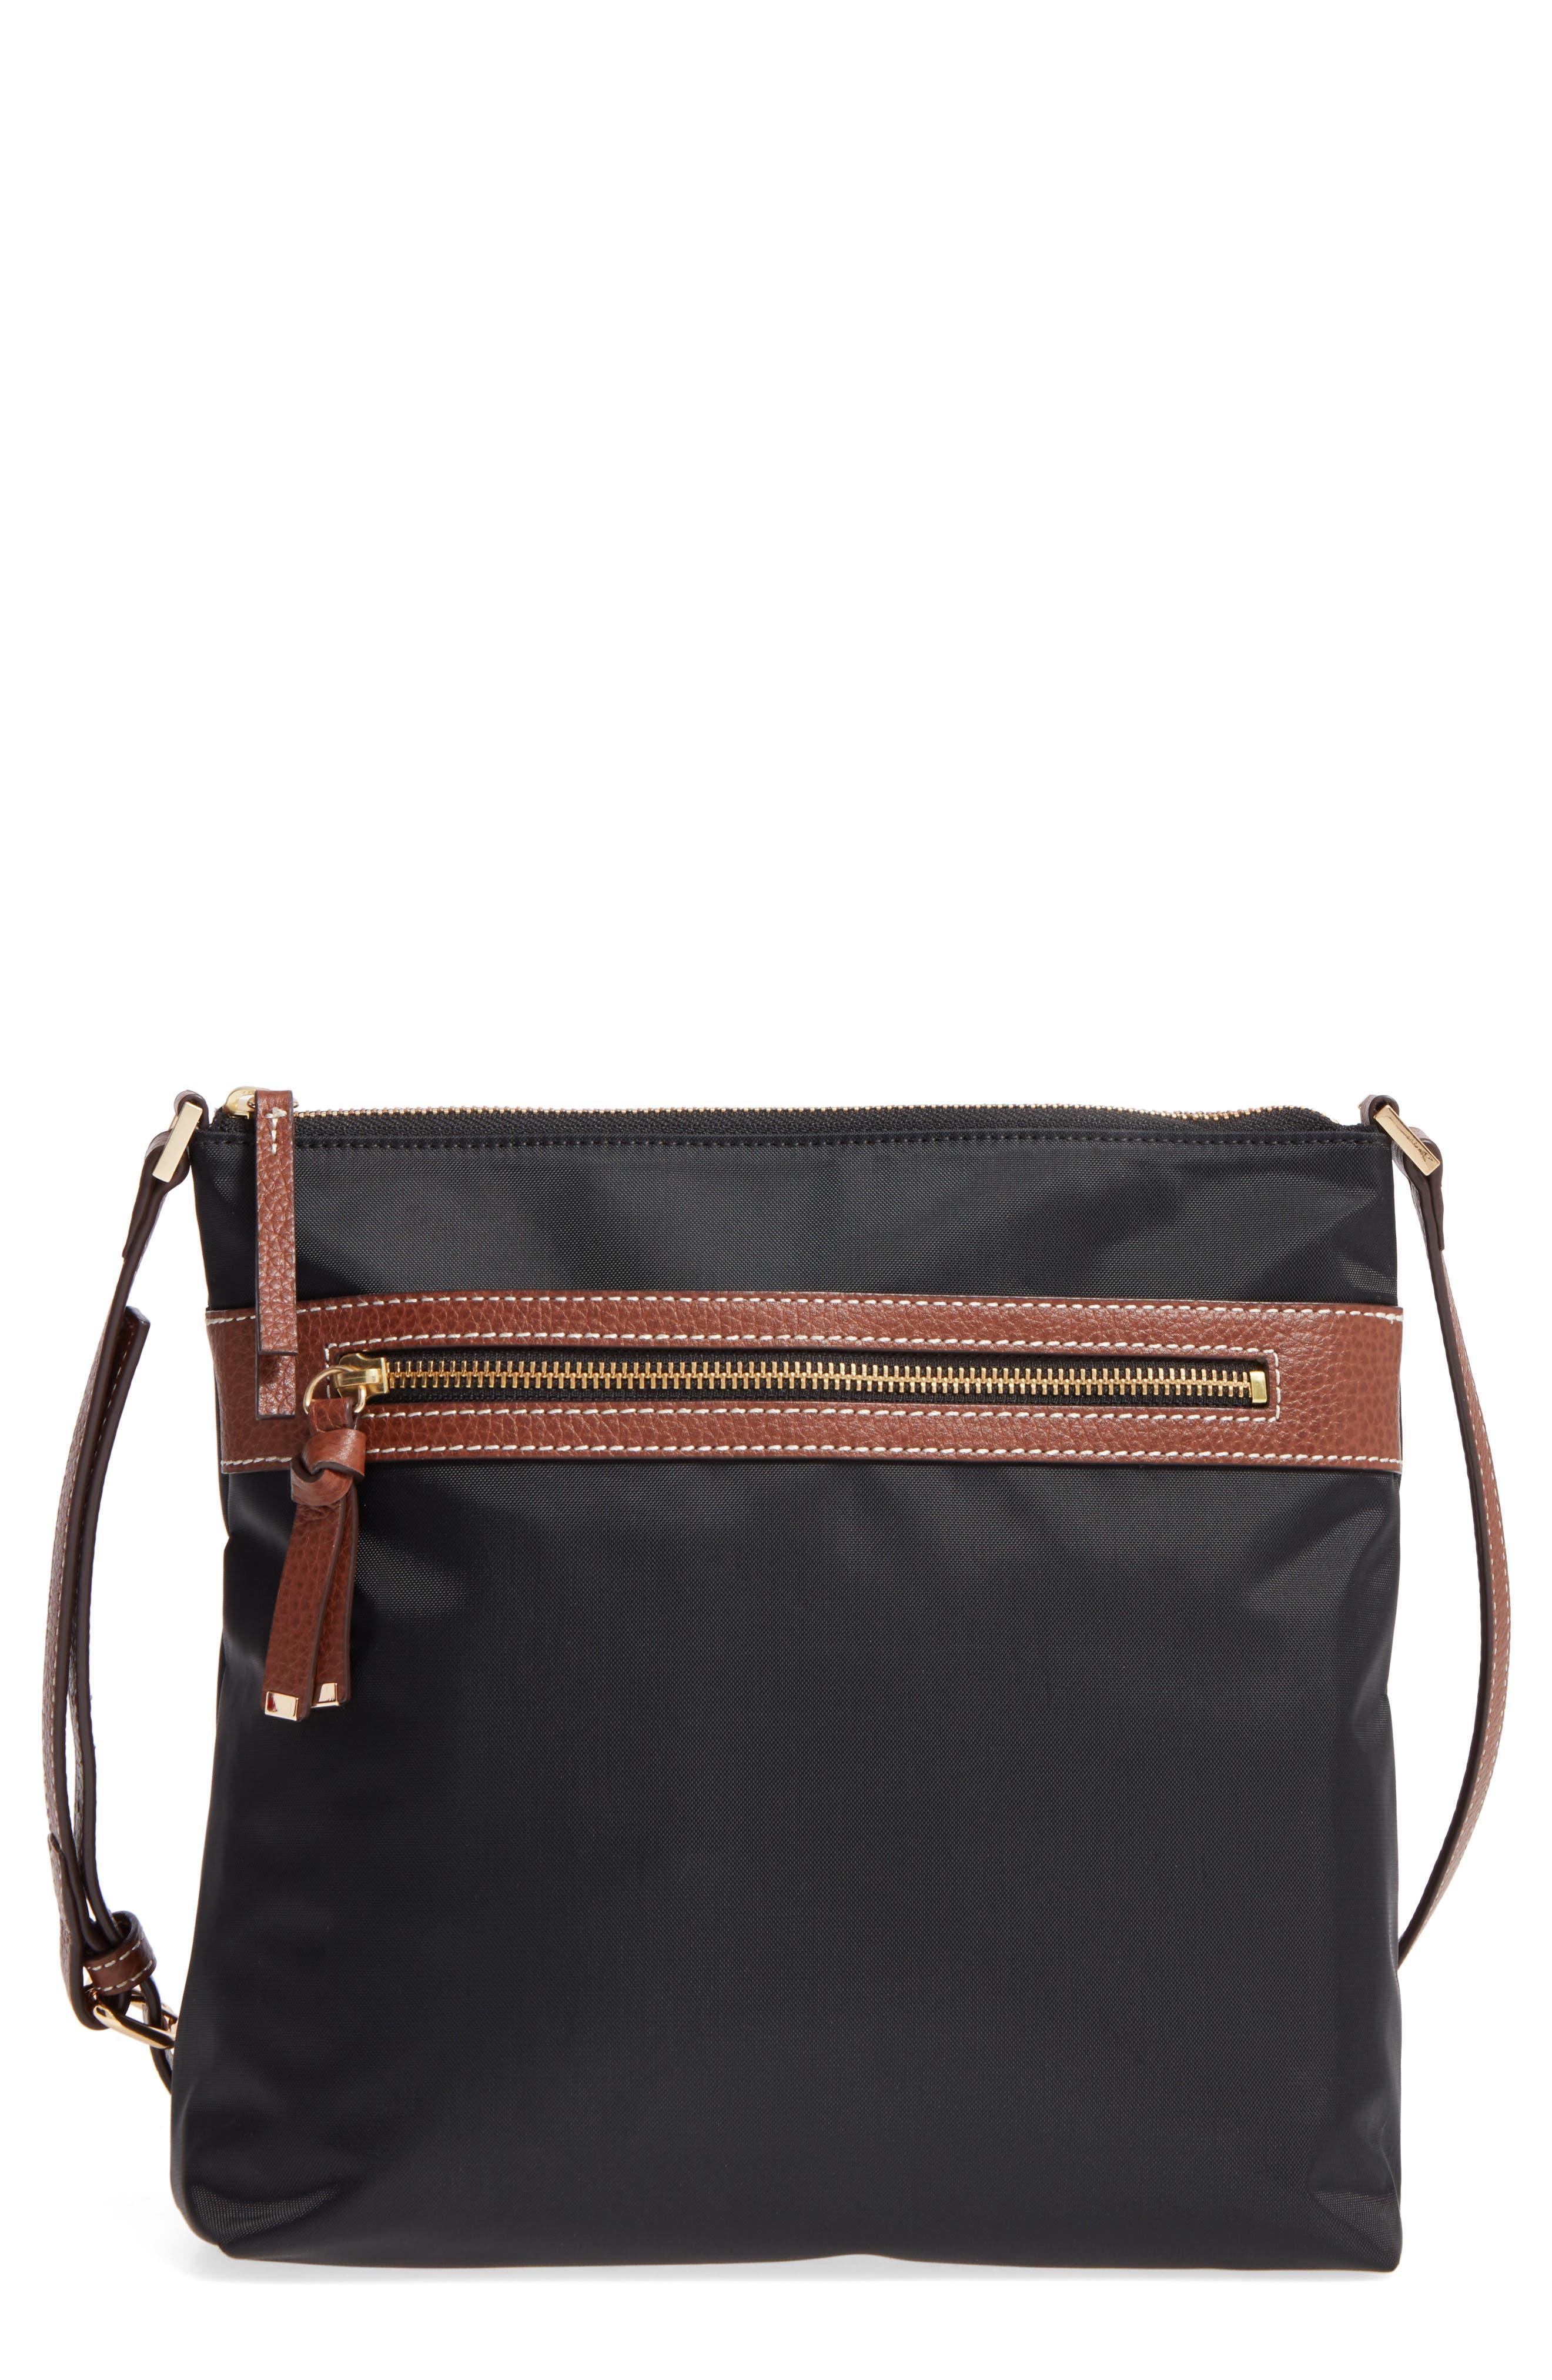 Alternate Image 1 Selected - Halogen Nylon Crossbody Bag